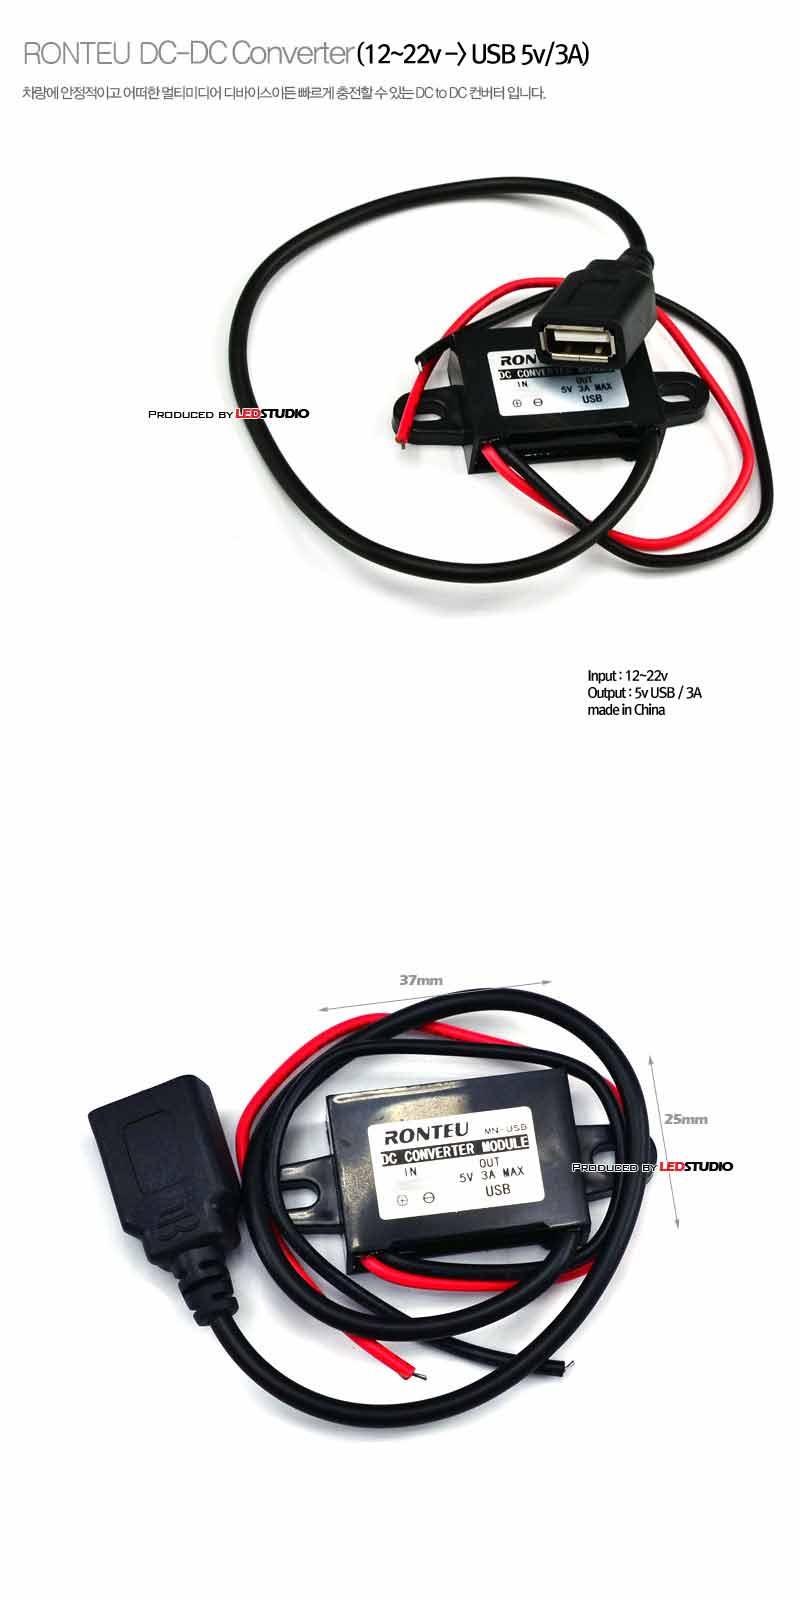 [12v~22v ▶ USB 5v / 3A 강압모듈] RONTEU DC-DC 컨버터 : USB 충전 단자 만들기용